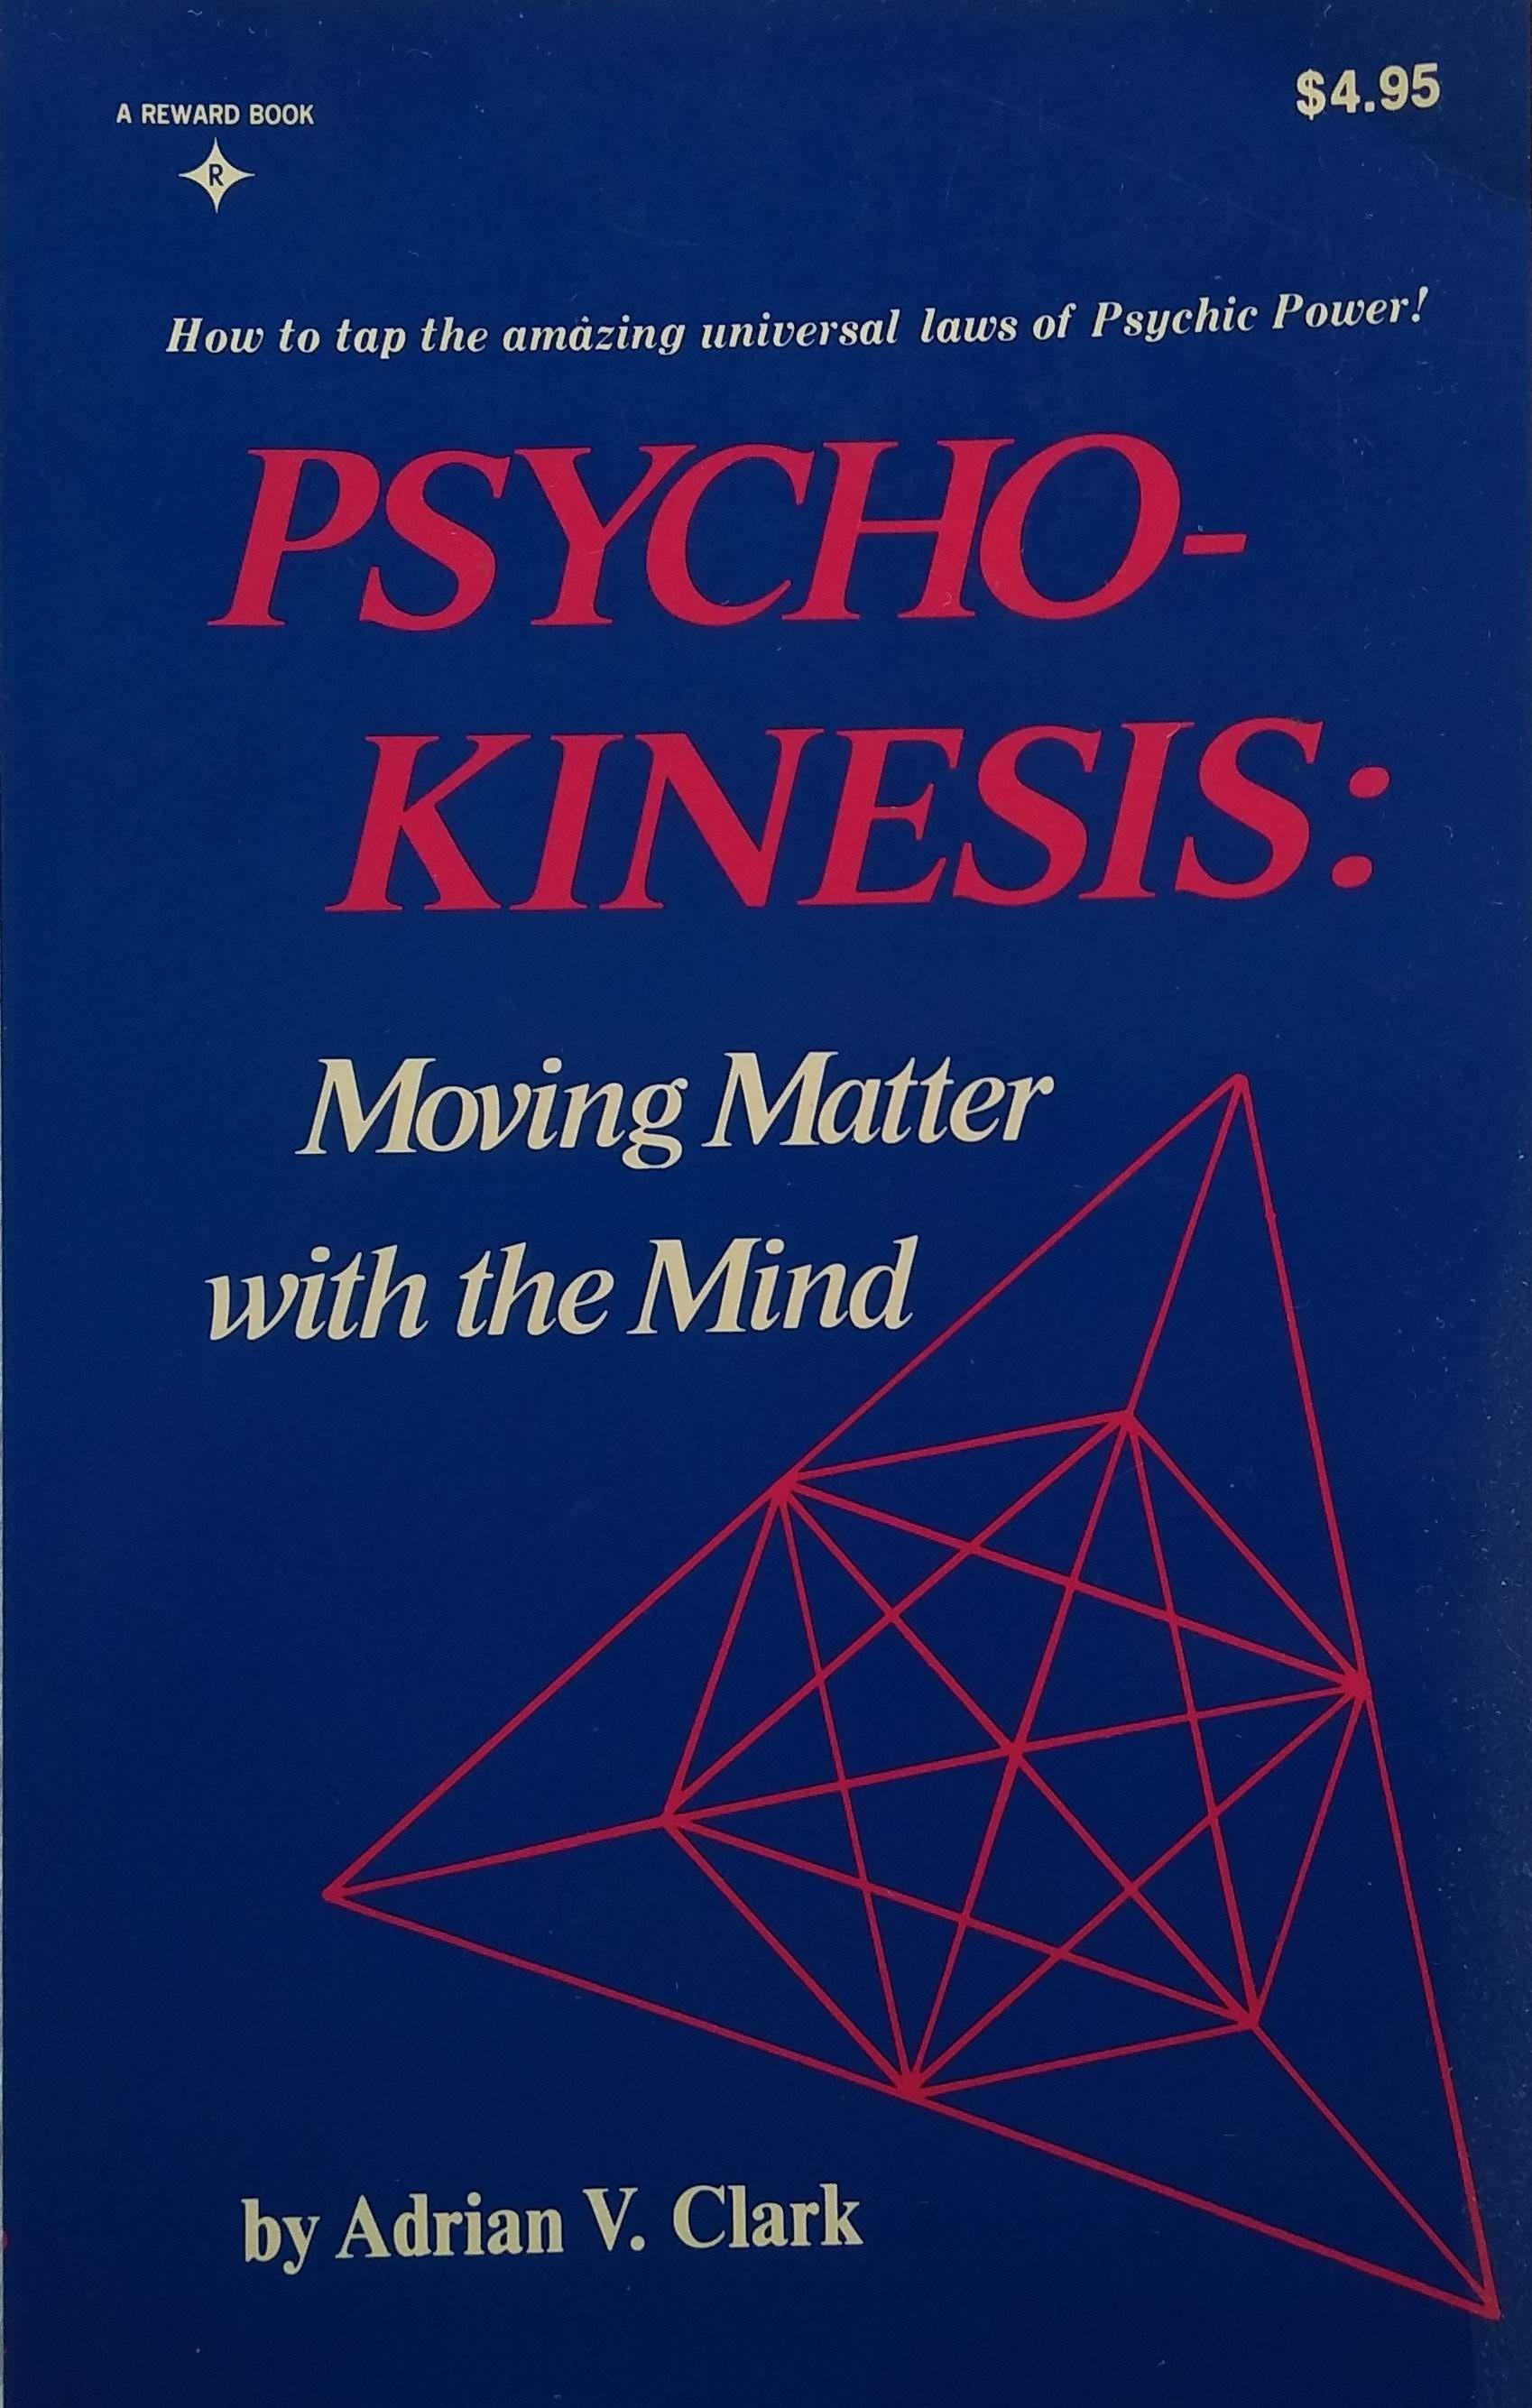 Psycho-kinesis